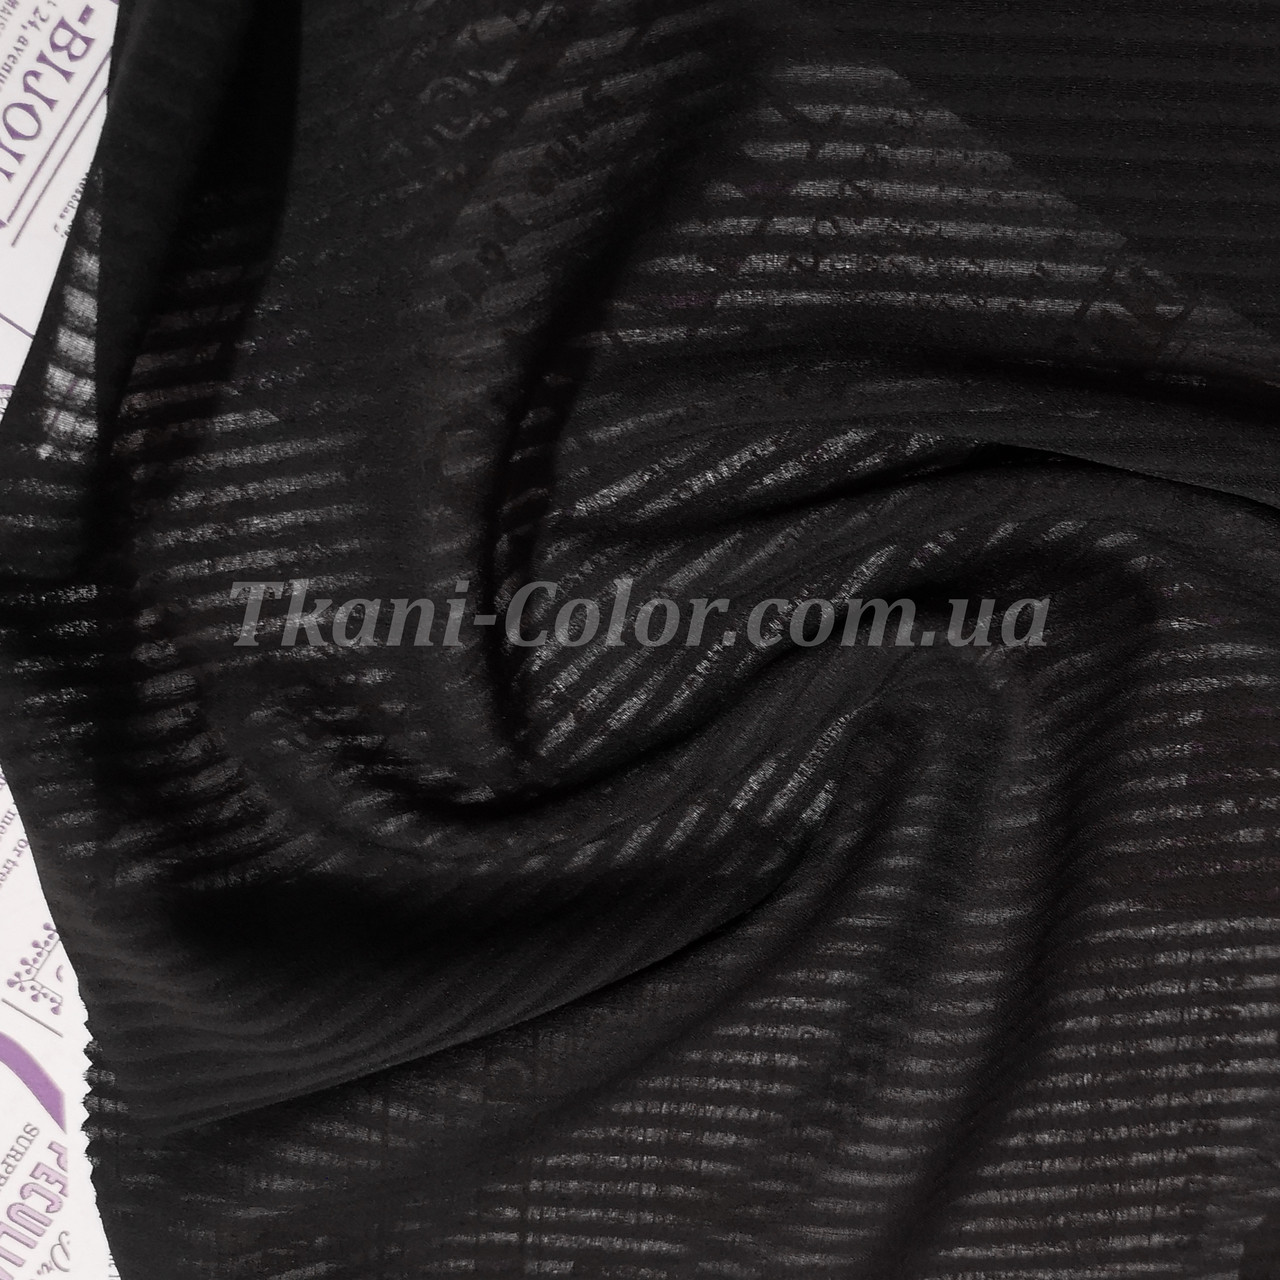 Тканина креп-шифон чорний смужка 4мм